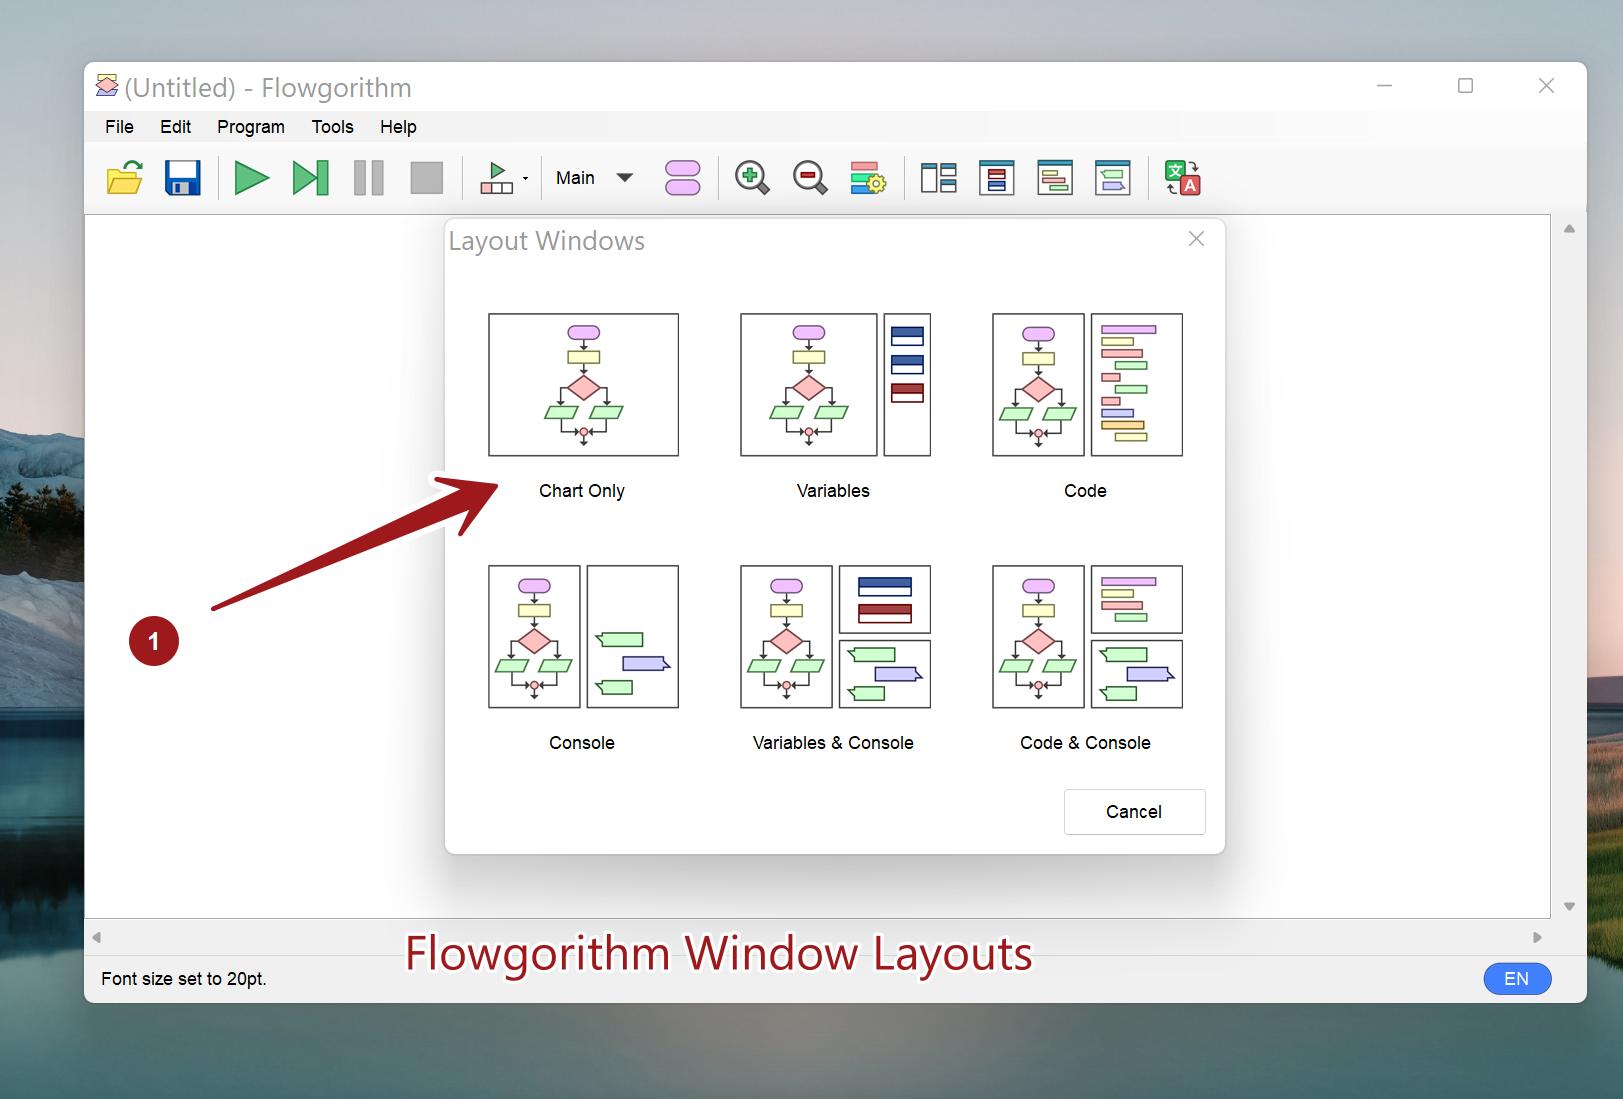 Flowgorithm Window Layouts